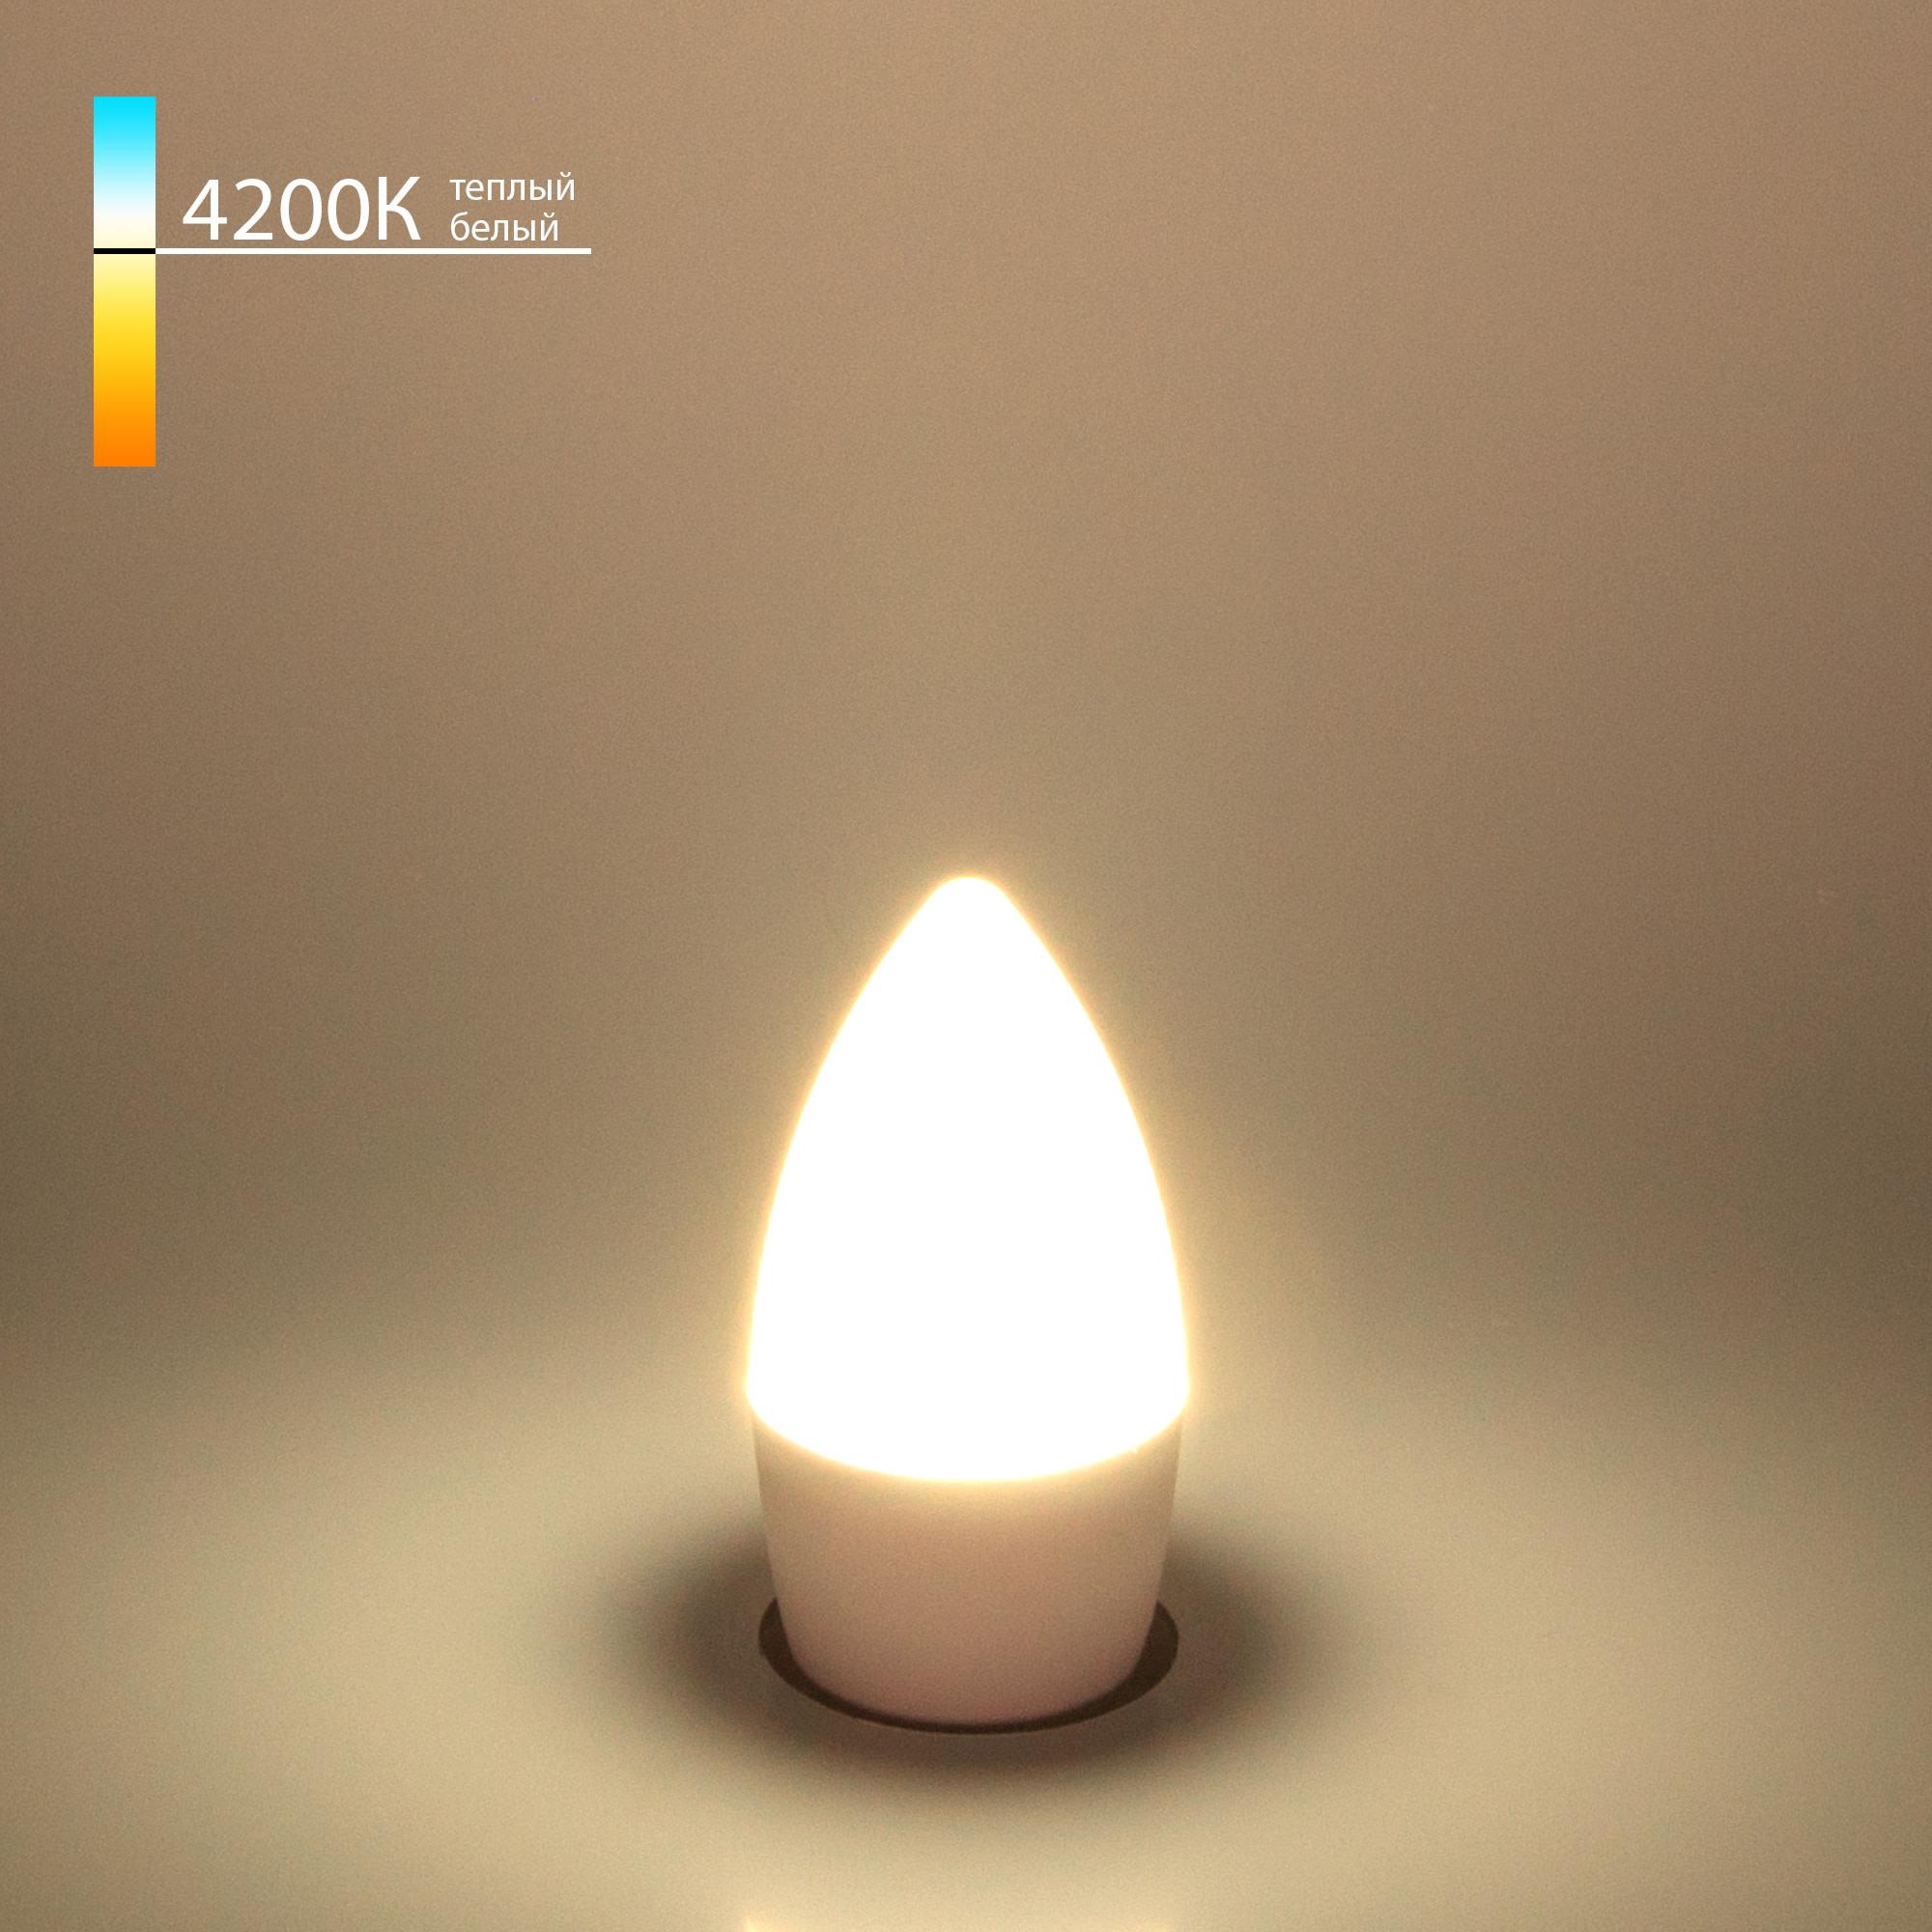 Лампа Electrostandard Свеча СD LED светодионая E27 6 Вт свеча 520 Лм нейтральный свет